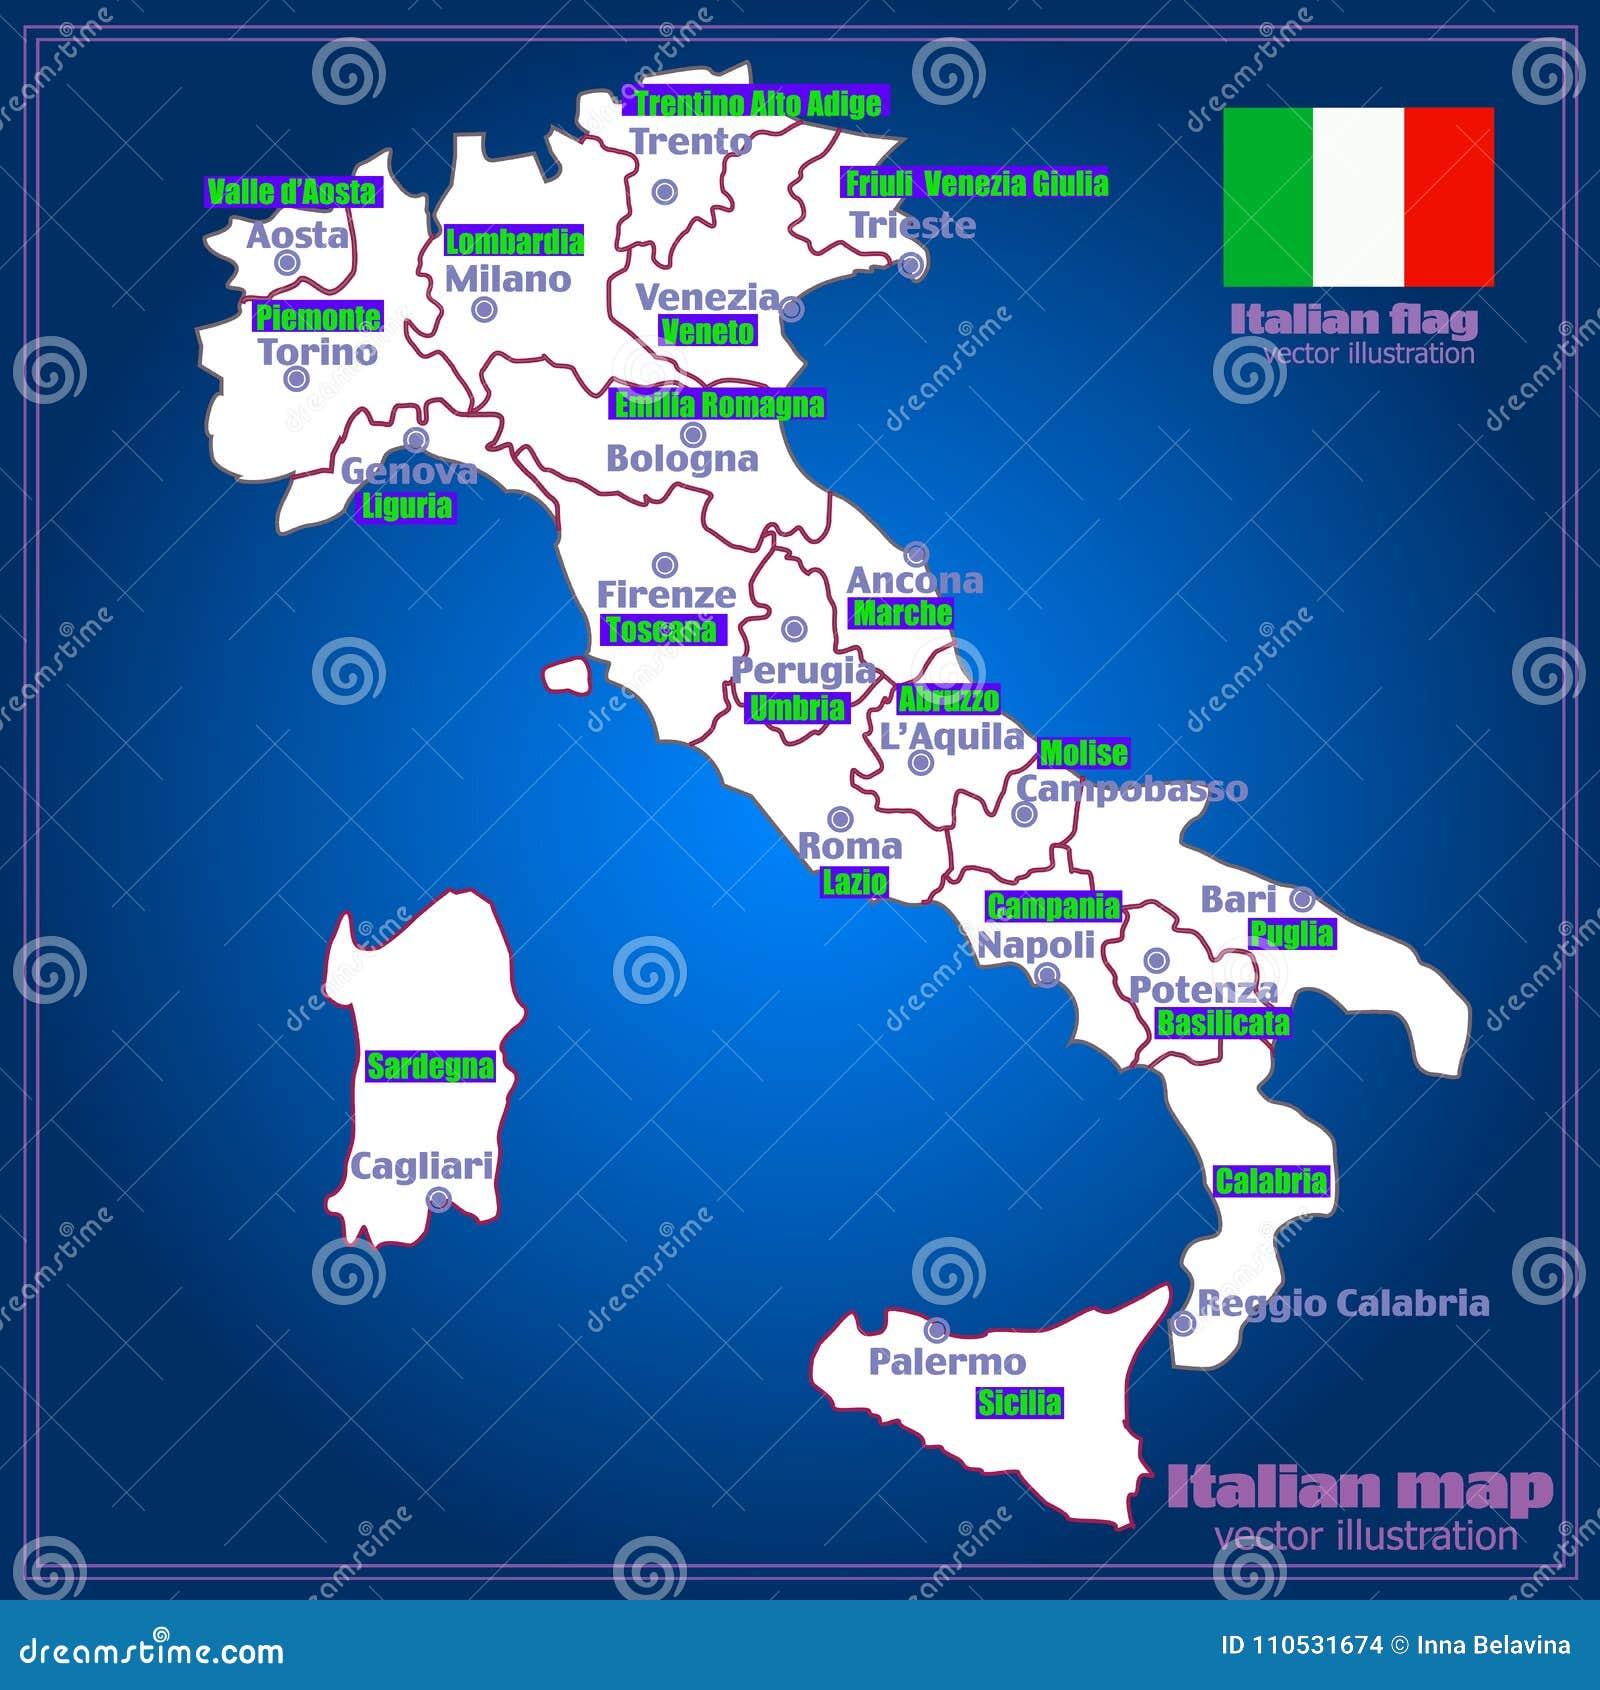 Italy Map Of Regions.Italy Map With Italian Regions Vector Stock Vector Illustration